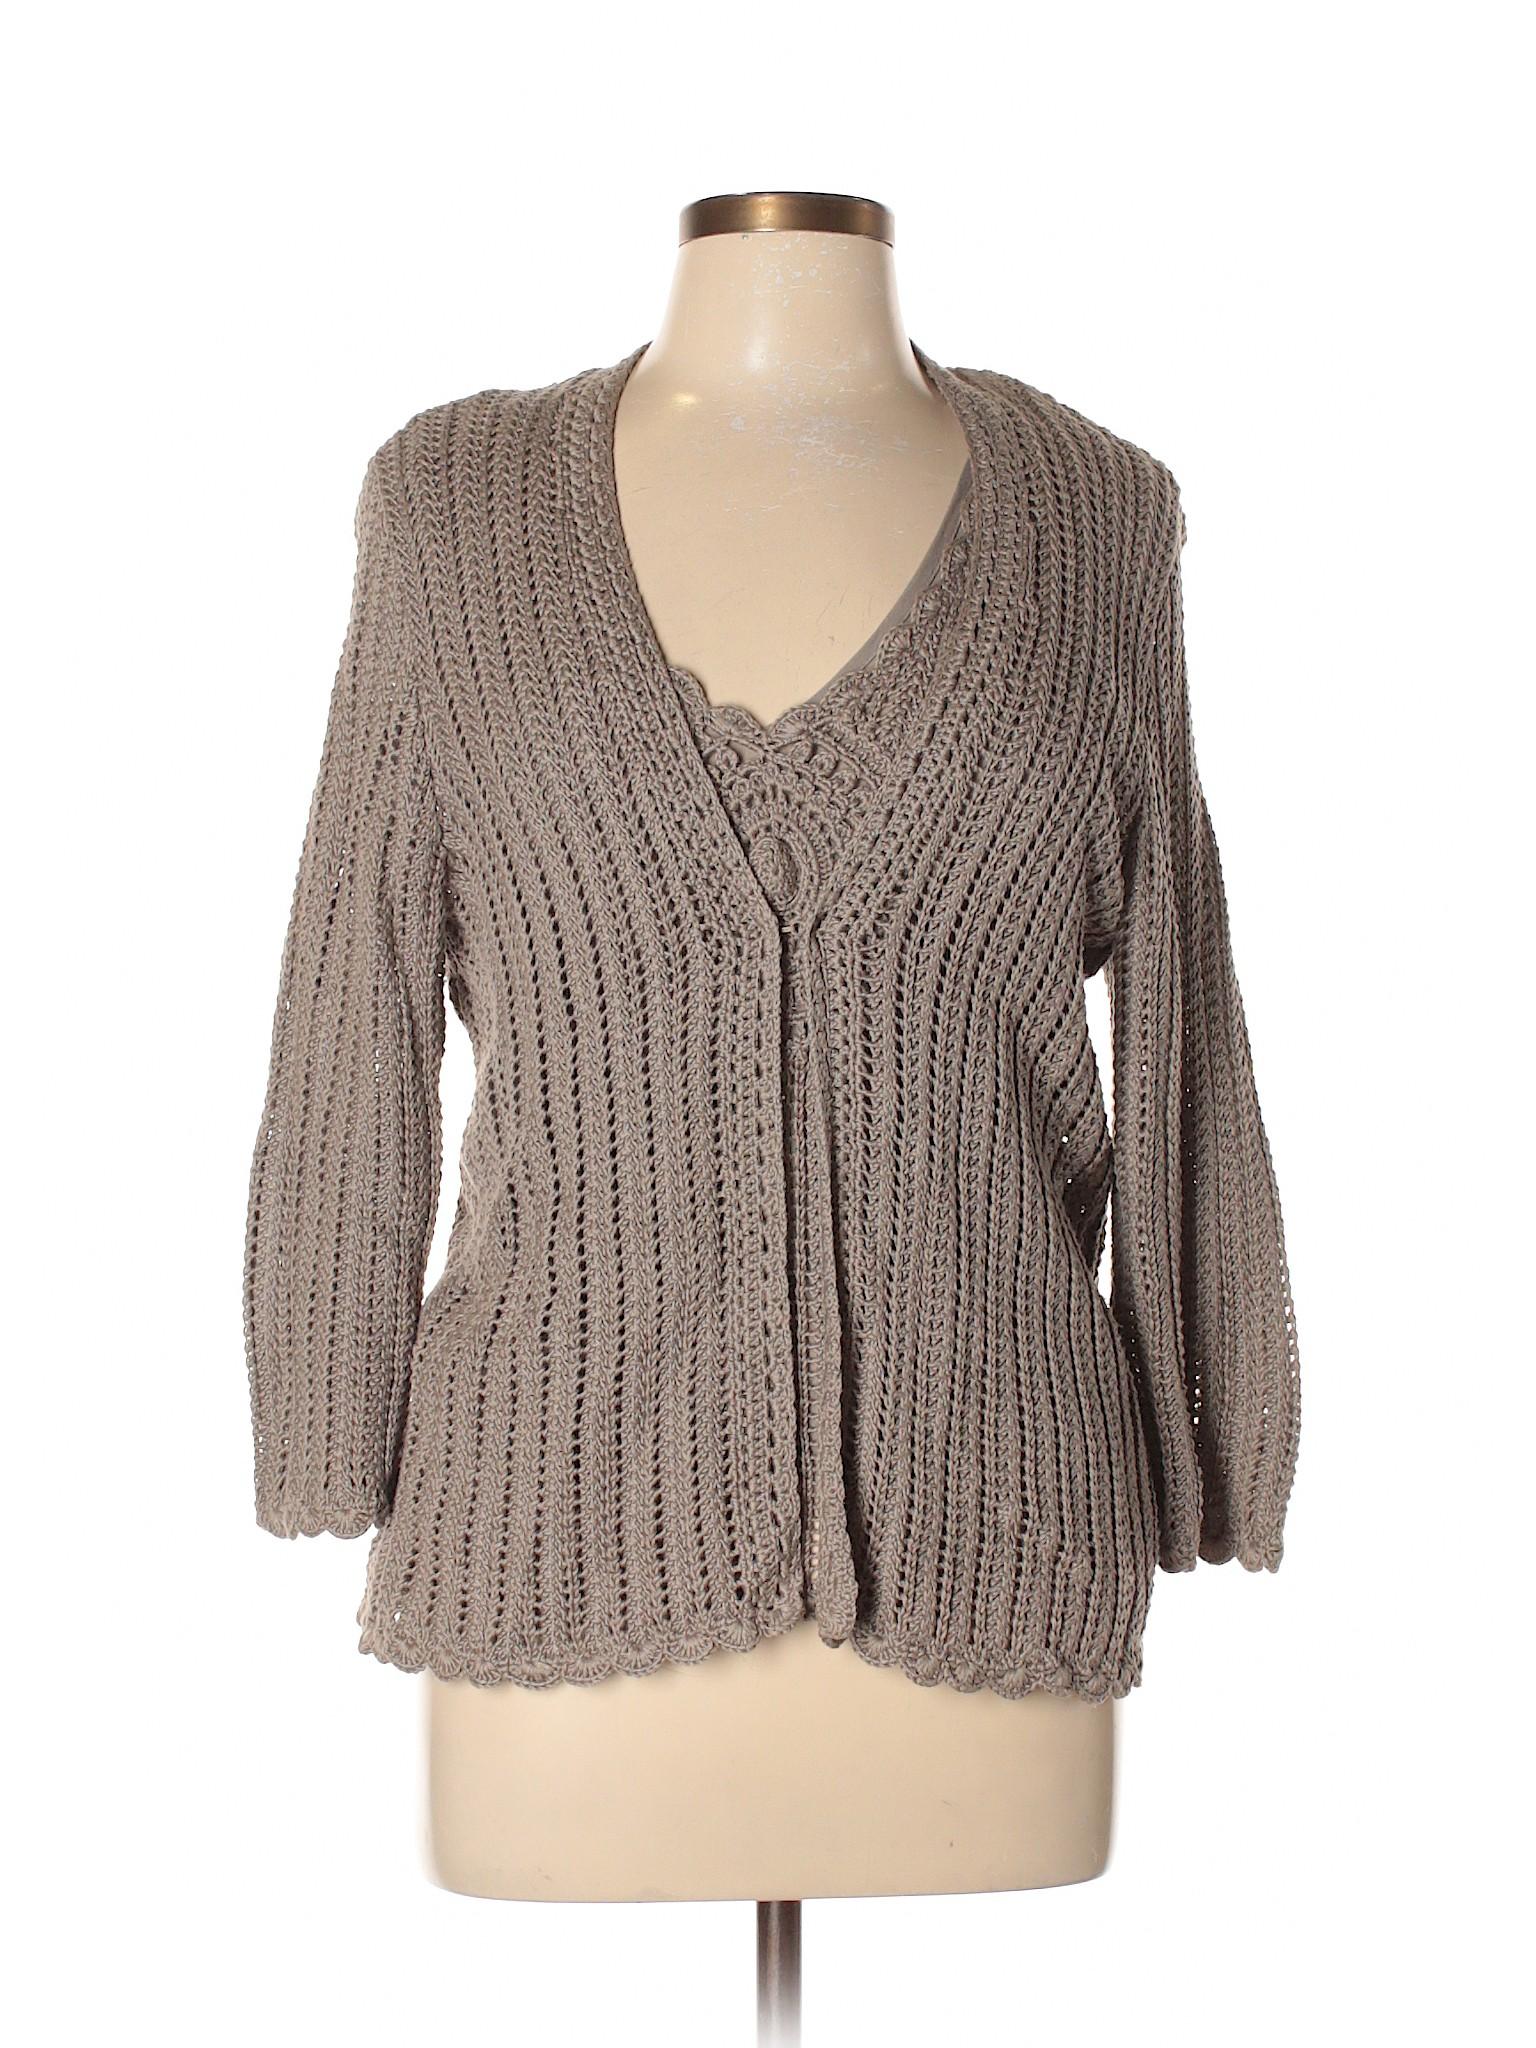 Boutique Pullover winter Sweater Sigrid Olsen aqzar